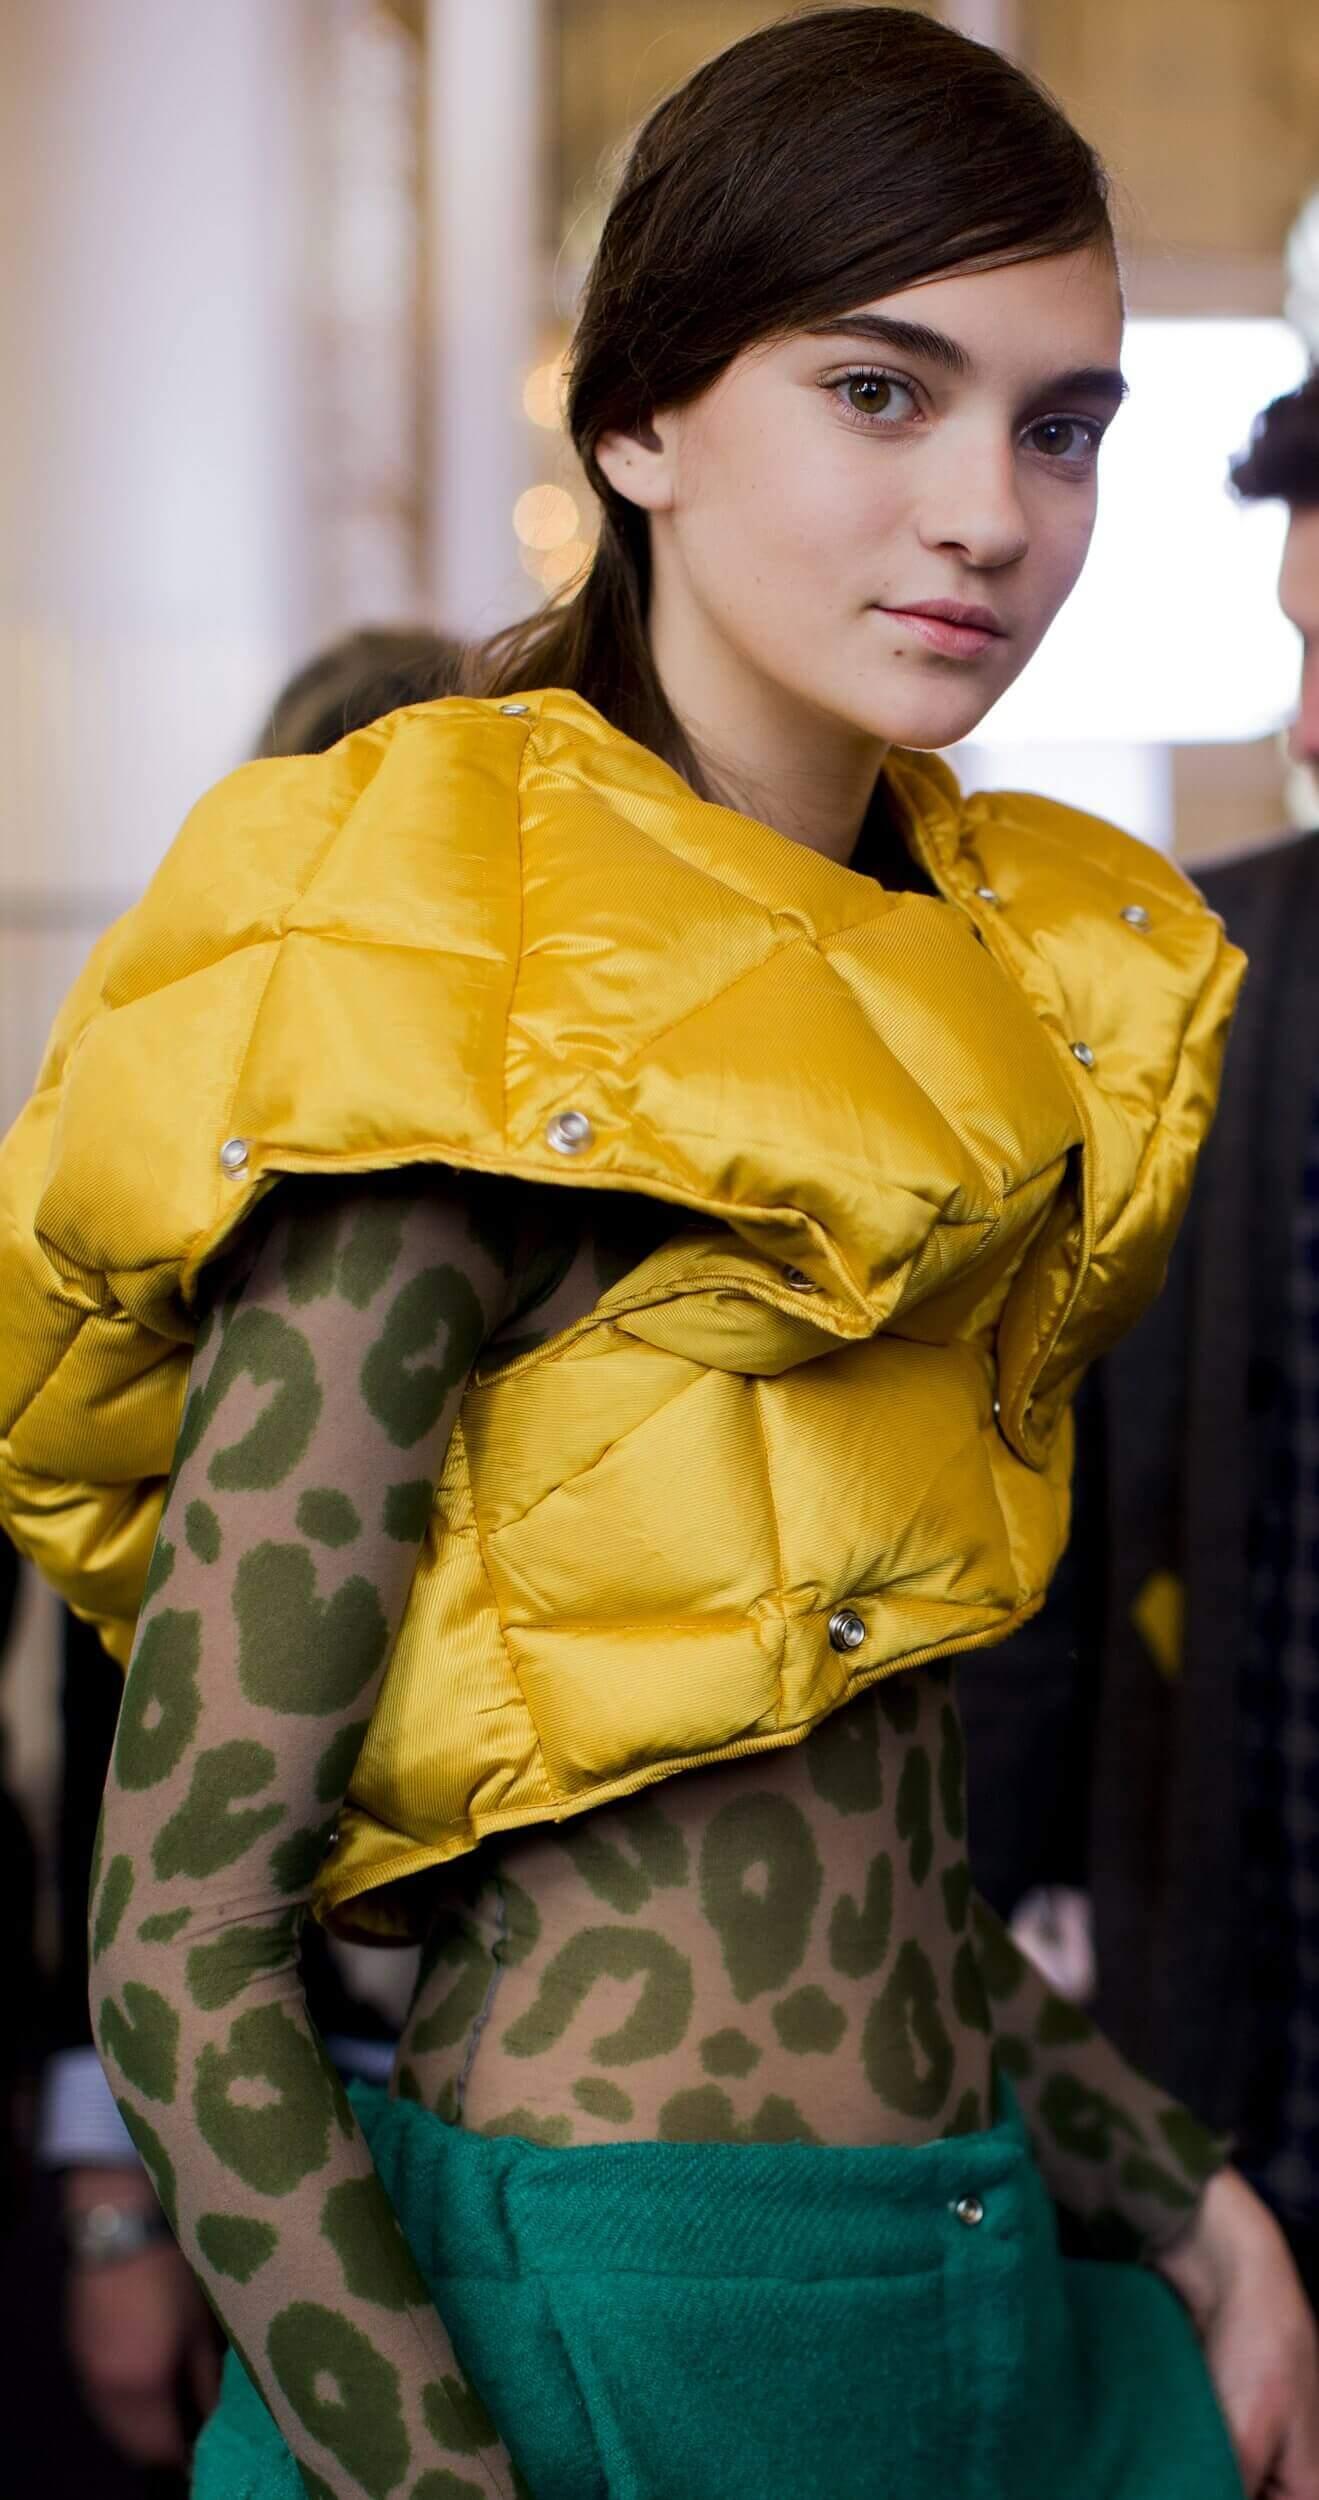 Paris fashion week Vogue photo Mustard color